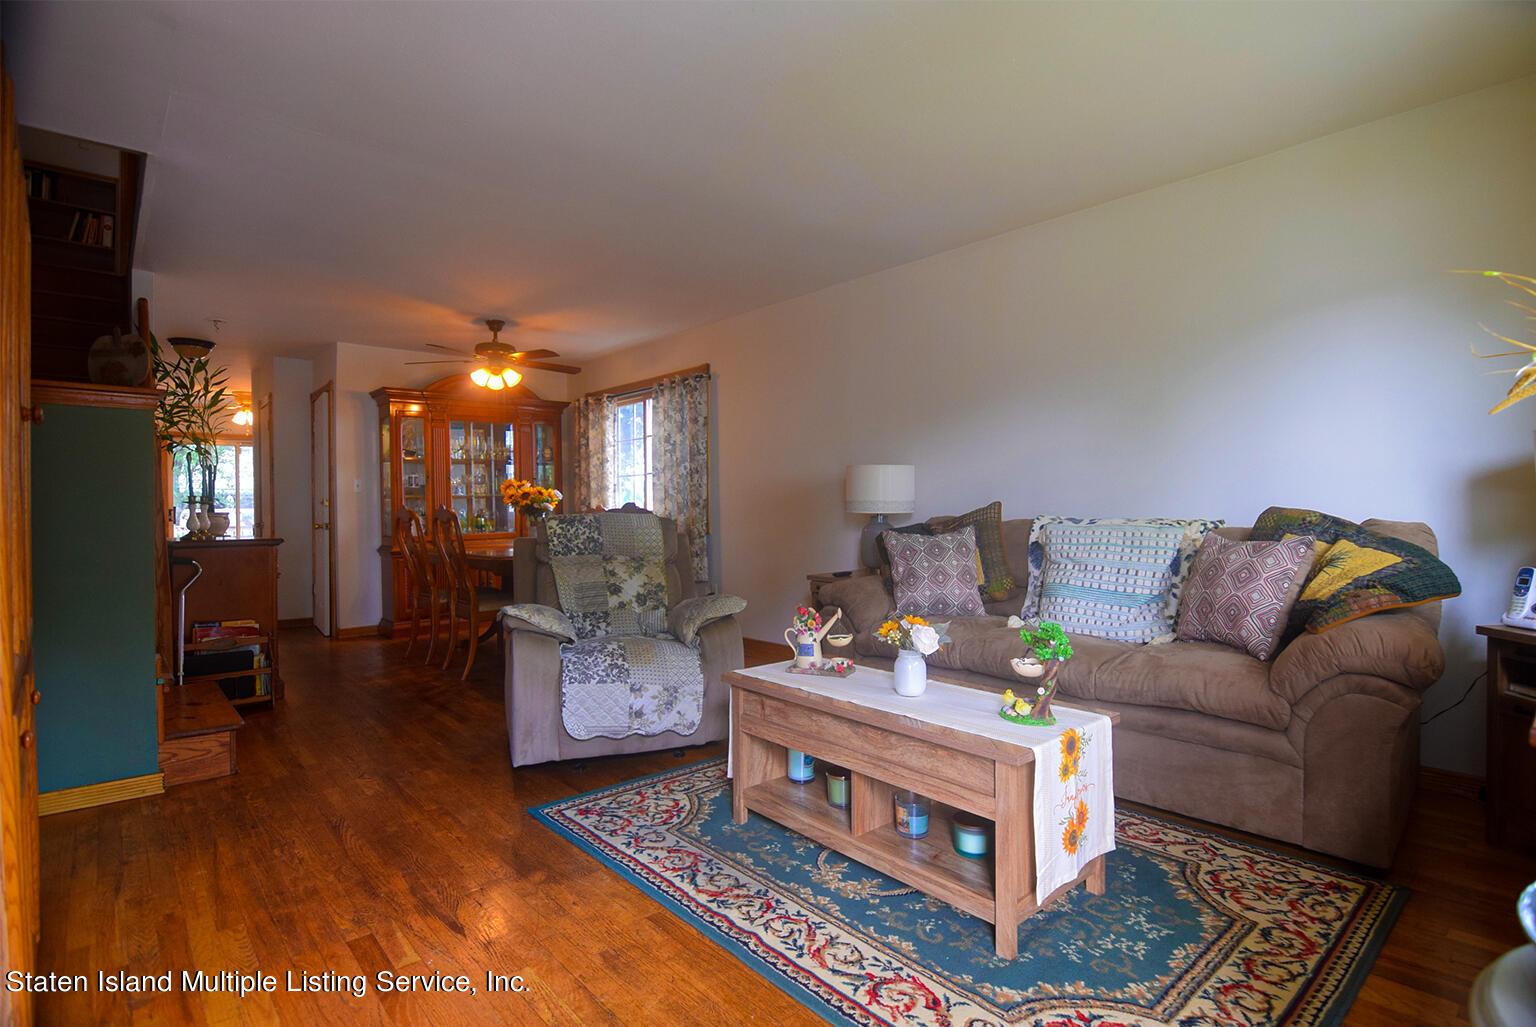 Single Family - Semi-Attached 524 Tennyson Drive  Staten Island, NY 10312, MLS-1149452-4